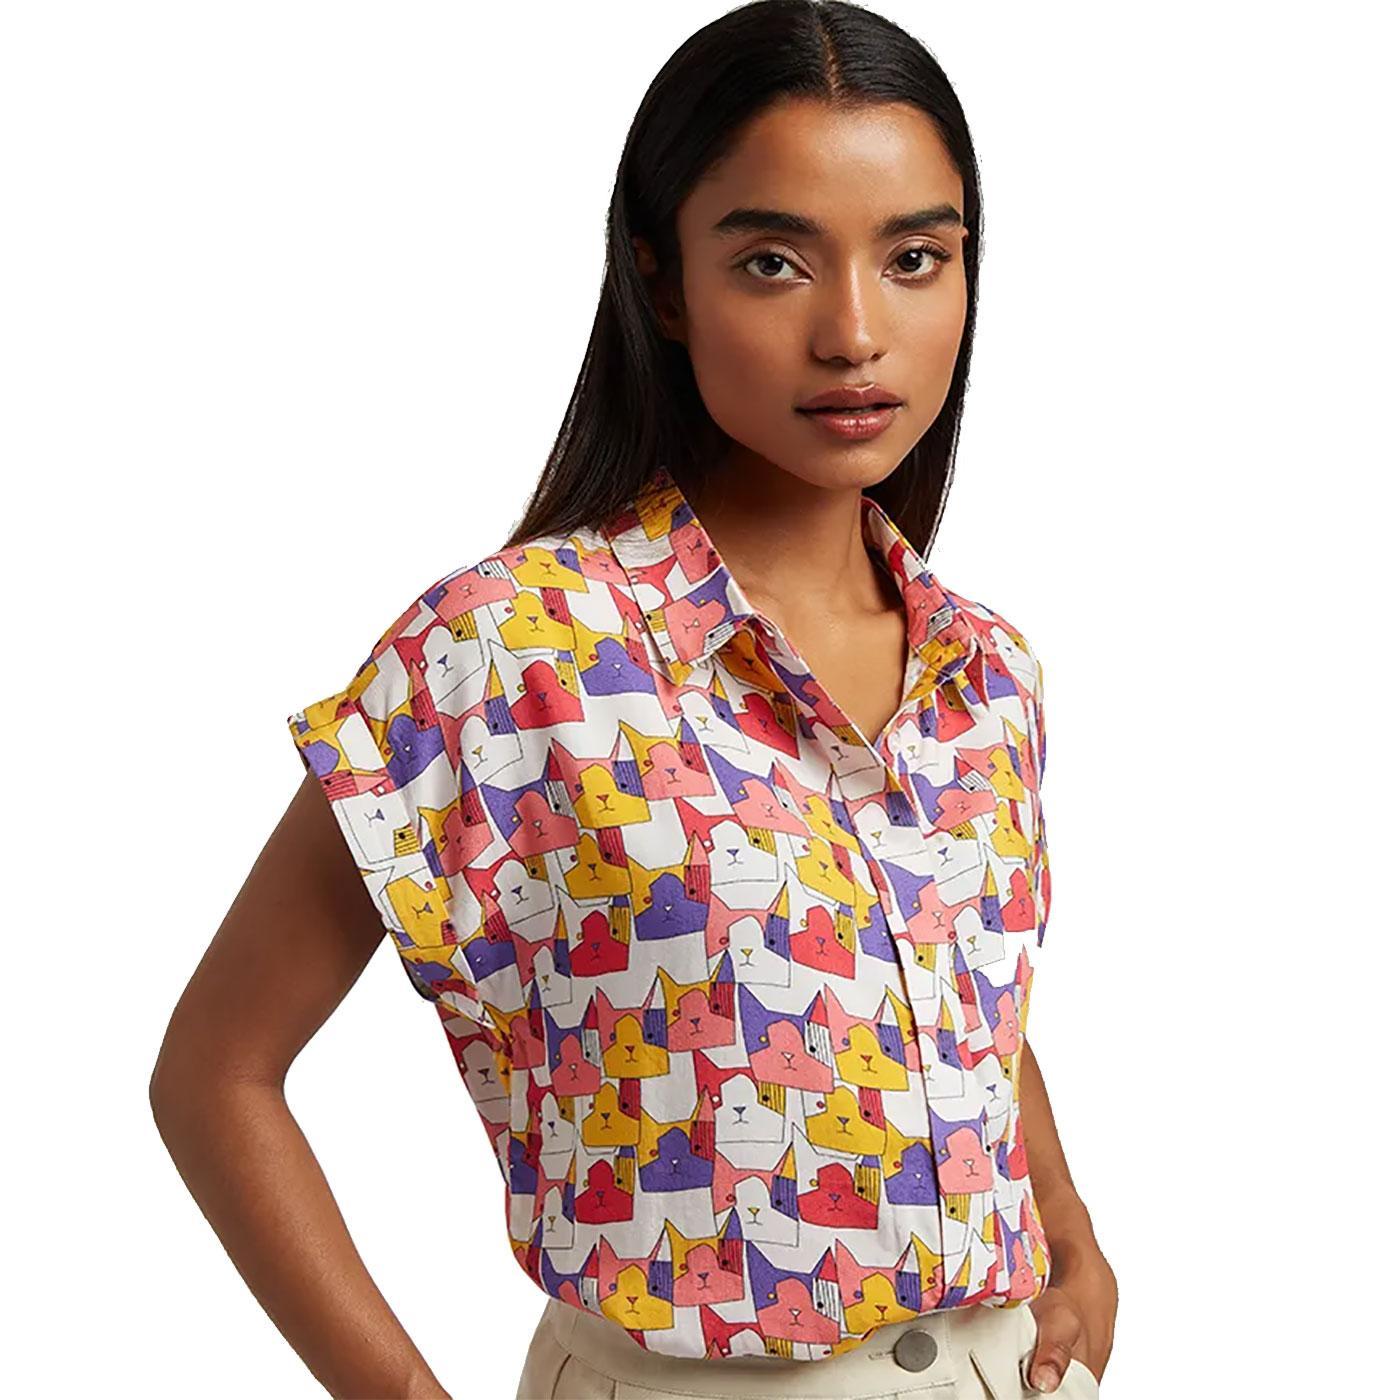 Abinaya Geocats LOUCHE Retro 70s Cat Print Shirt